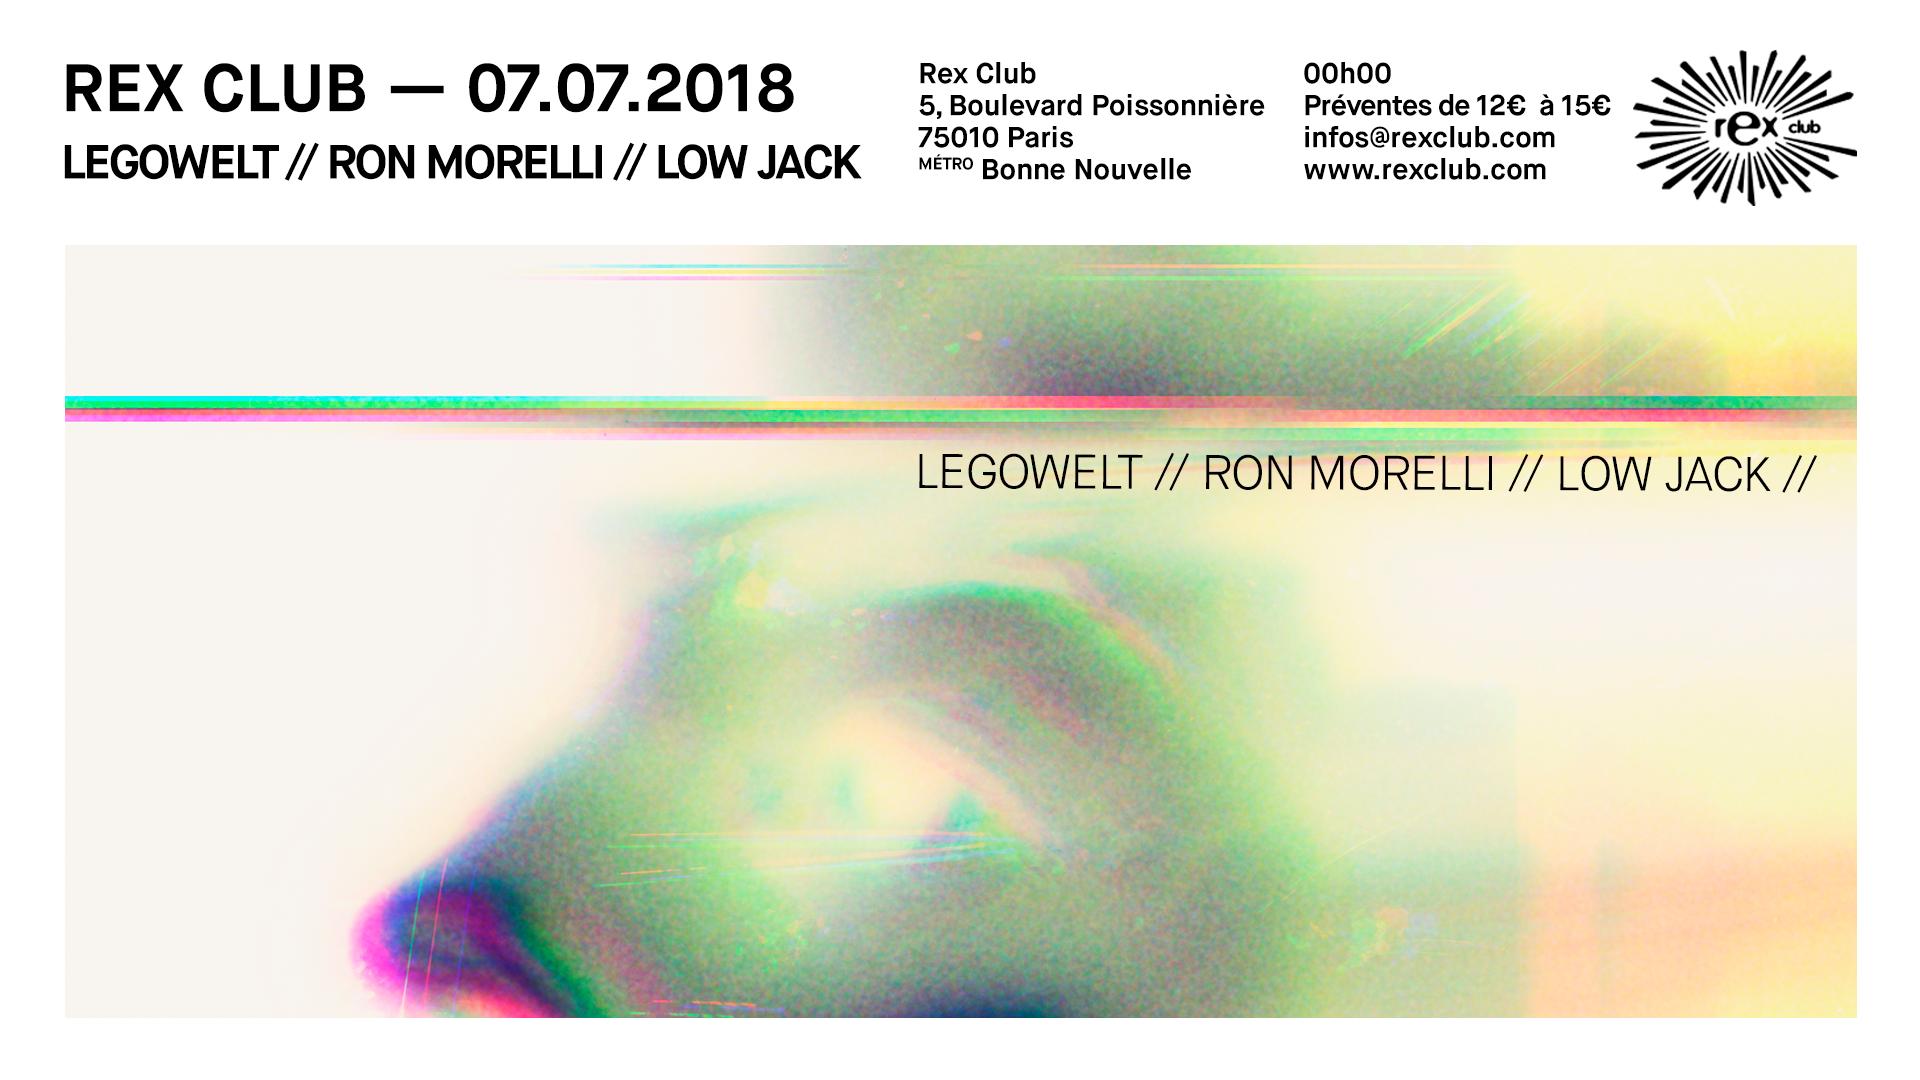 20180707_rex_club_legowelt_facebook_event_banner_1920x1080